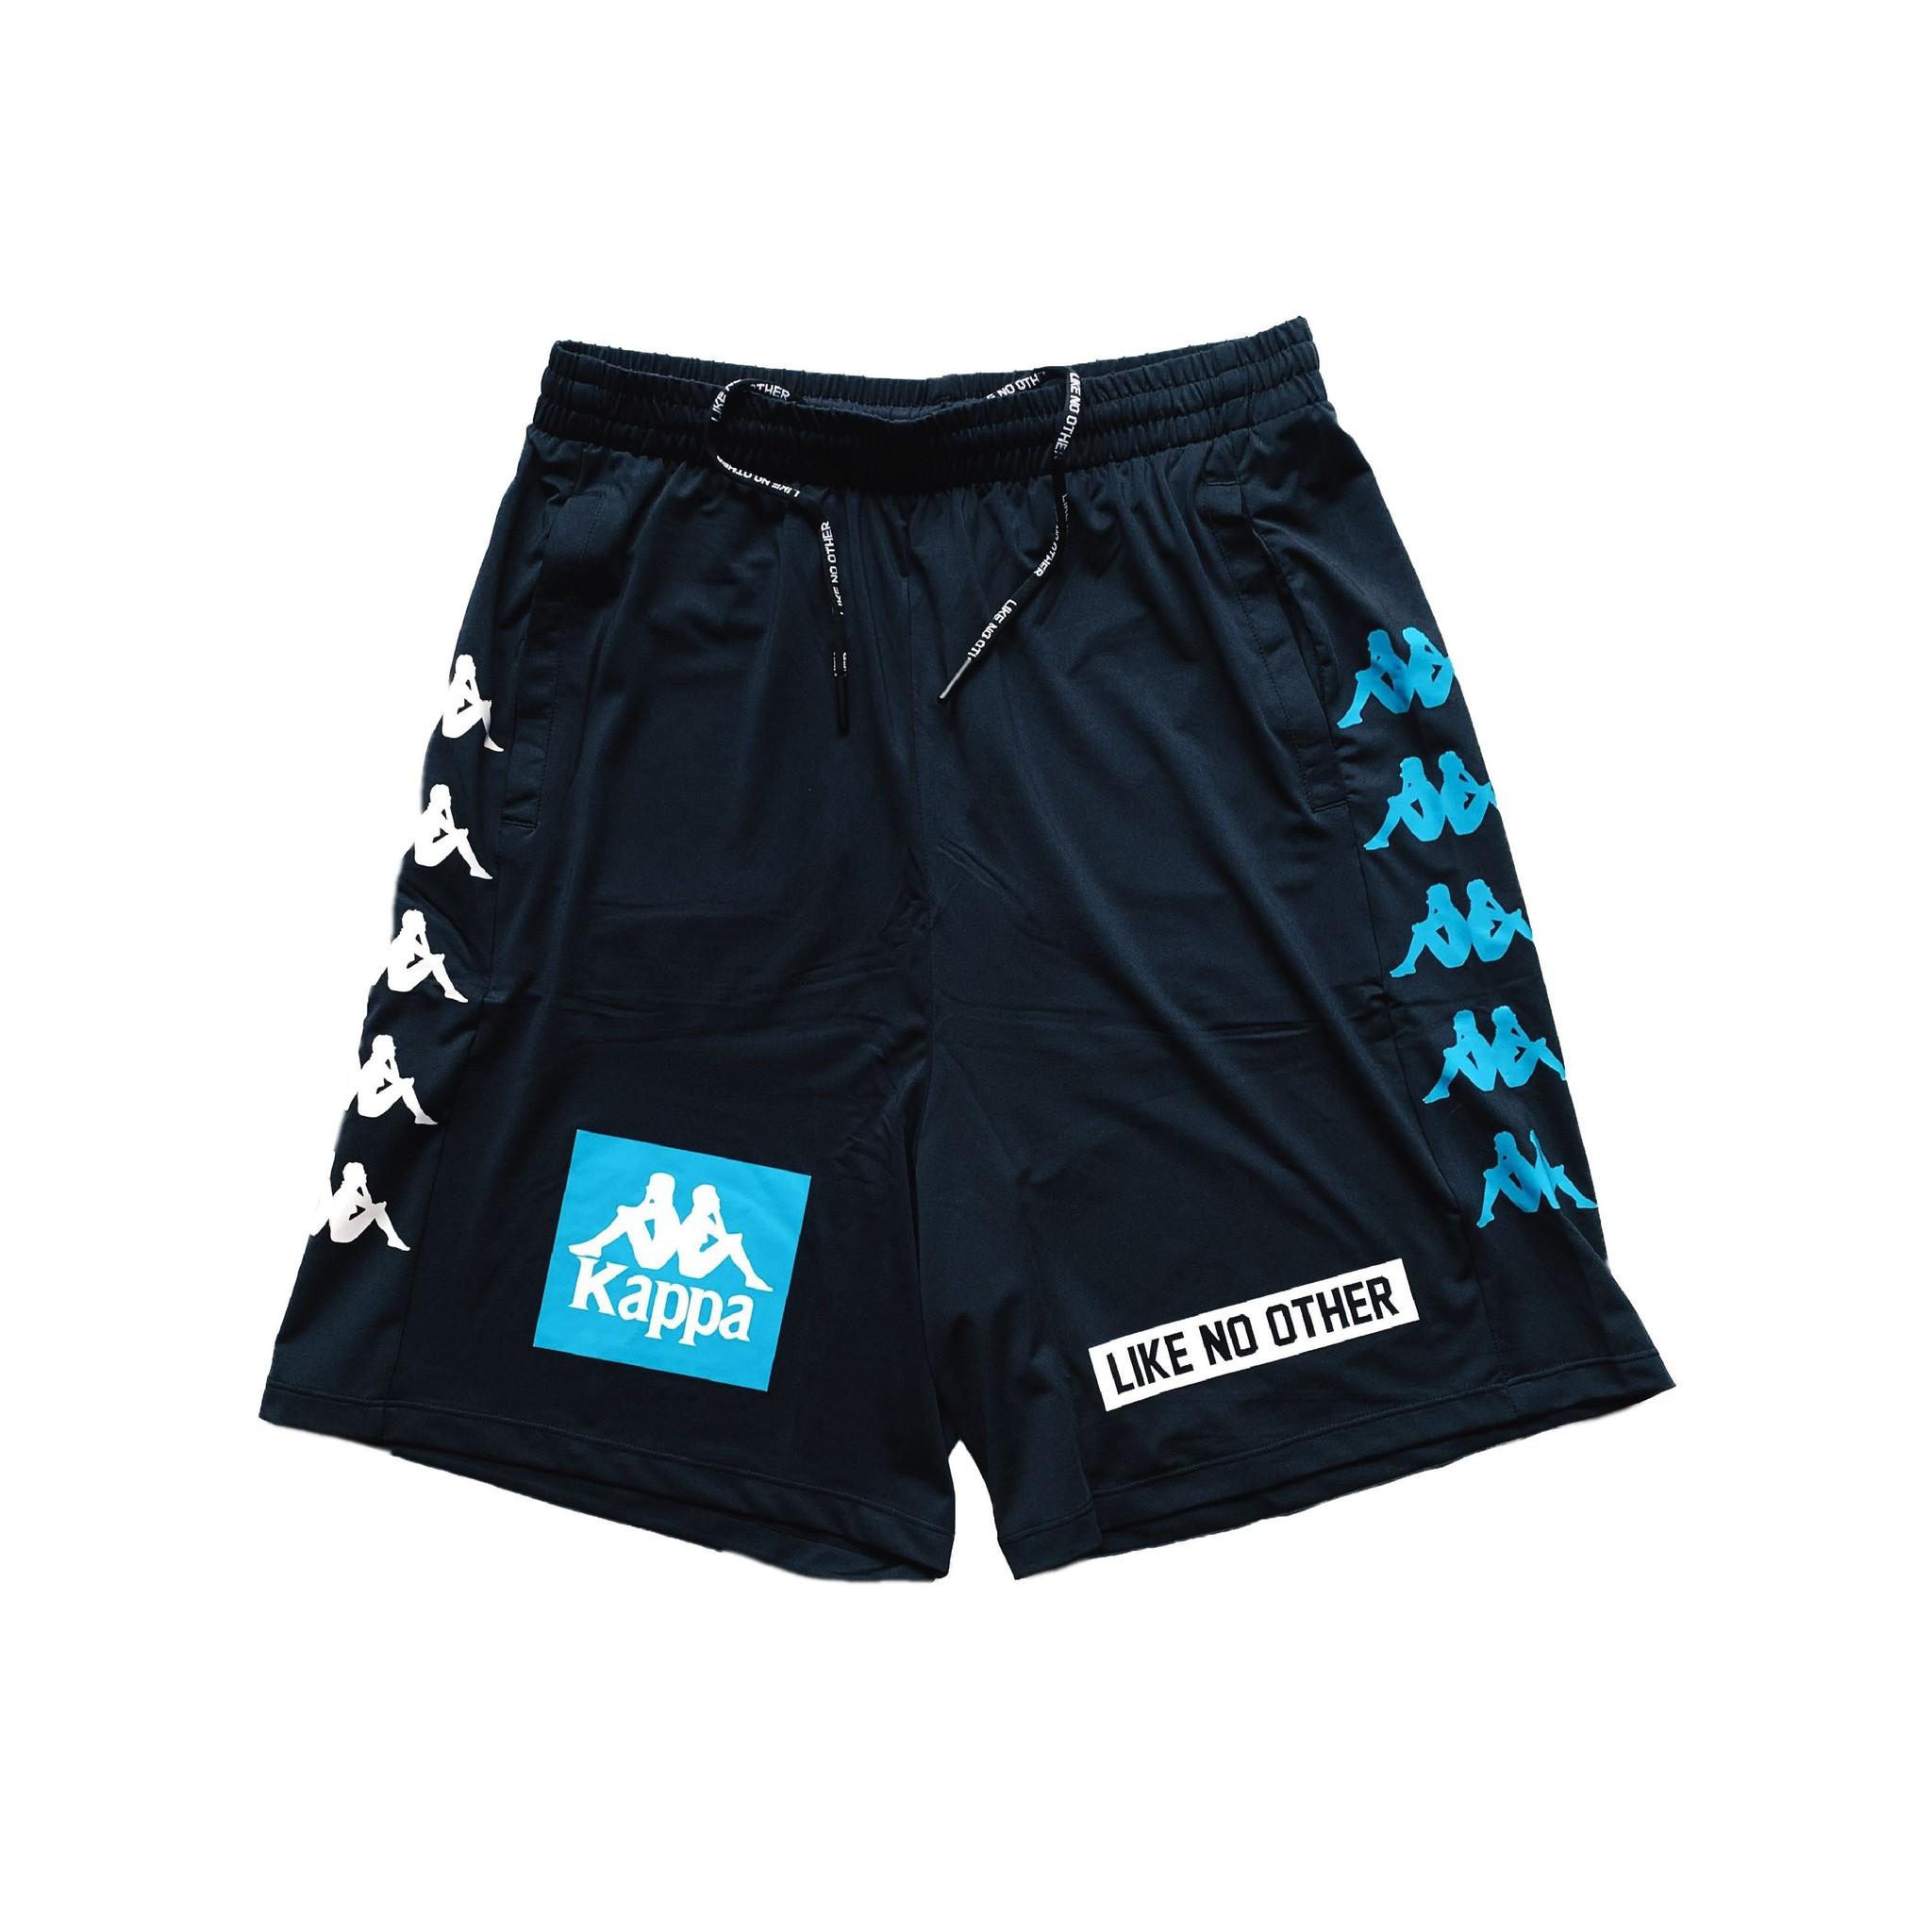 kappa Kappa Boax Shorts Black